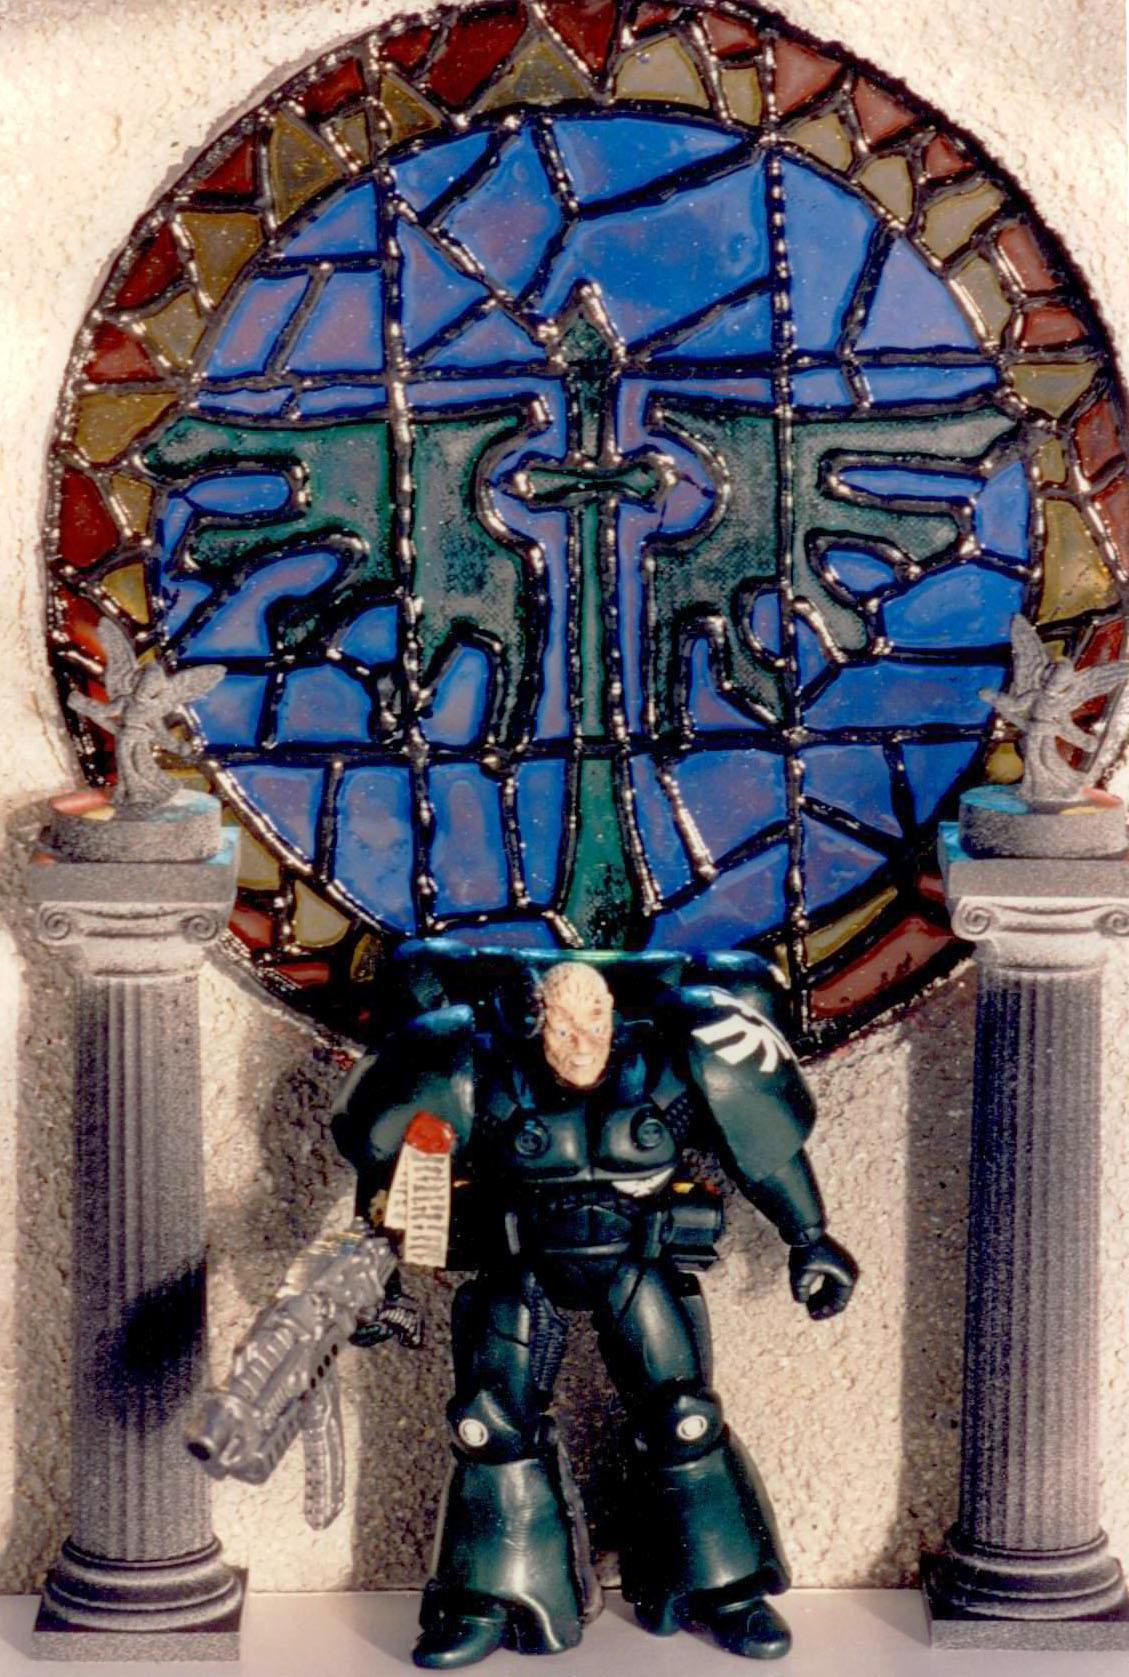 Action Figure, Astartes, Dark Angels, Darkangels, Imperium, Large Astartes, Large Space Marine, Military, Space Marines, Spacemarine, War, Warhammer 40,000, Warhammer Fantasy